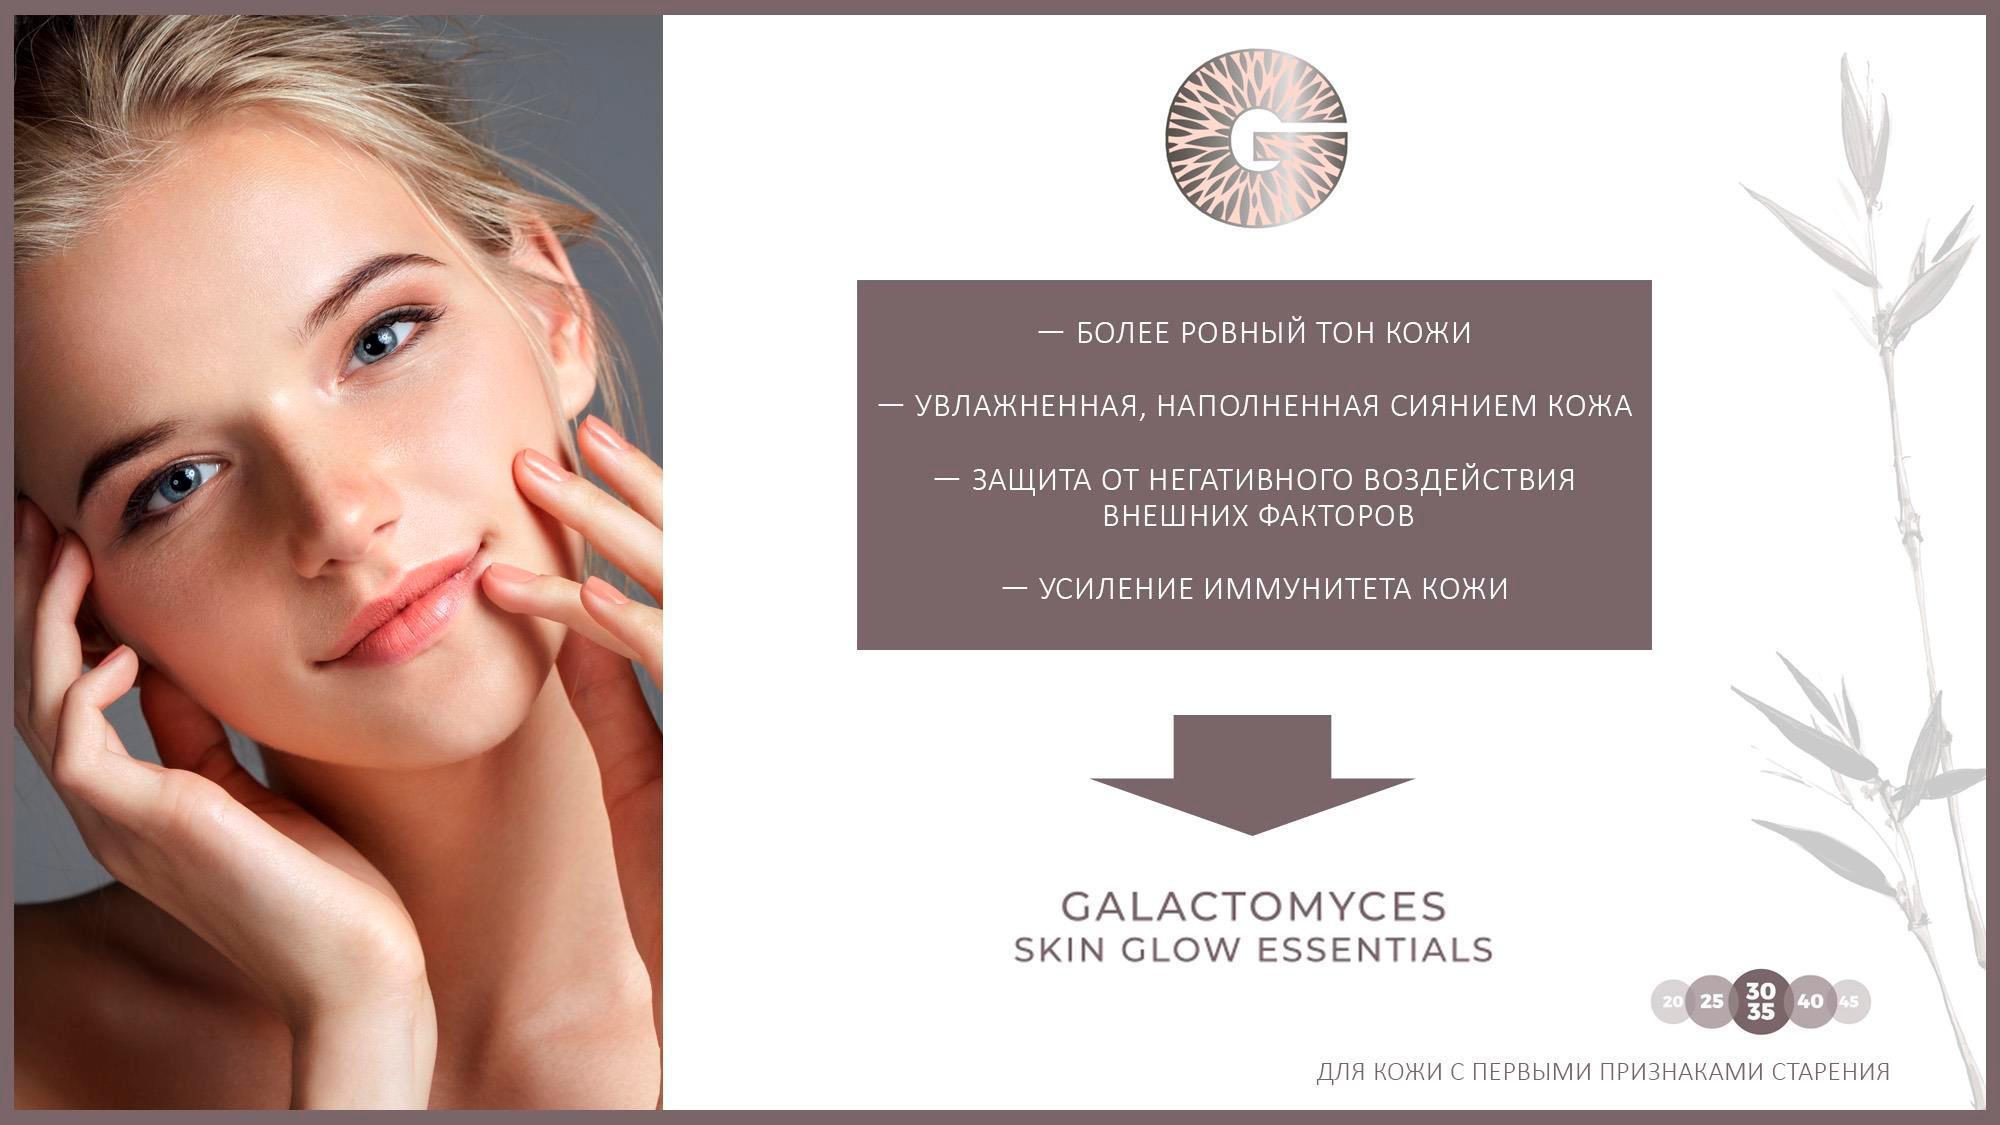 Galactomyces skin glow essentials - Белита-М